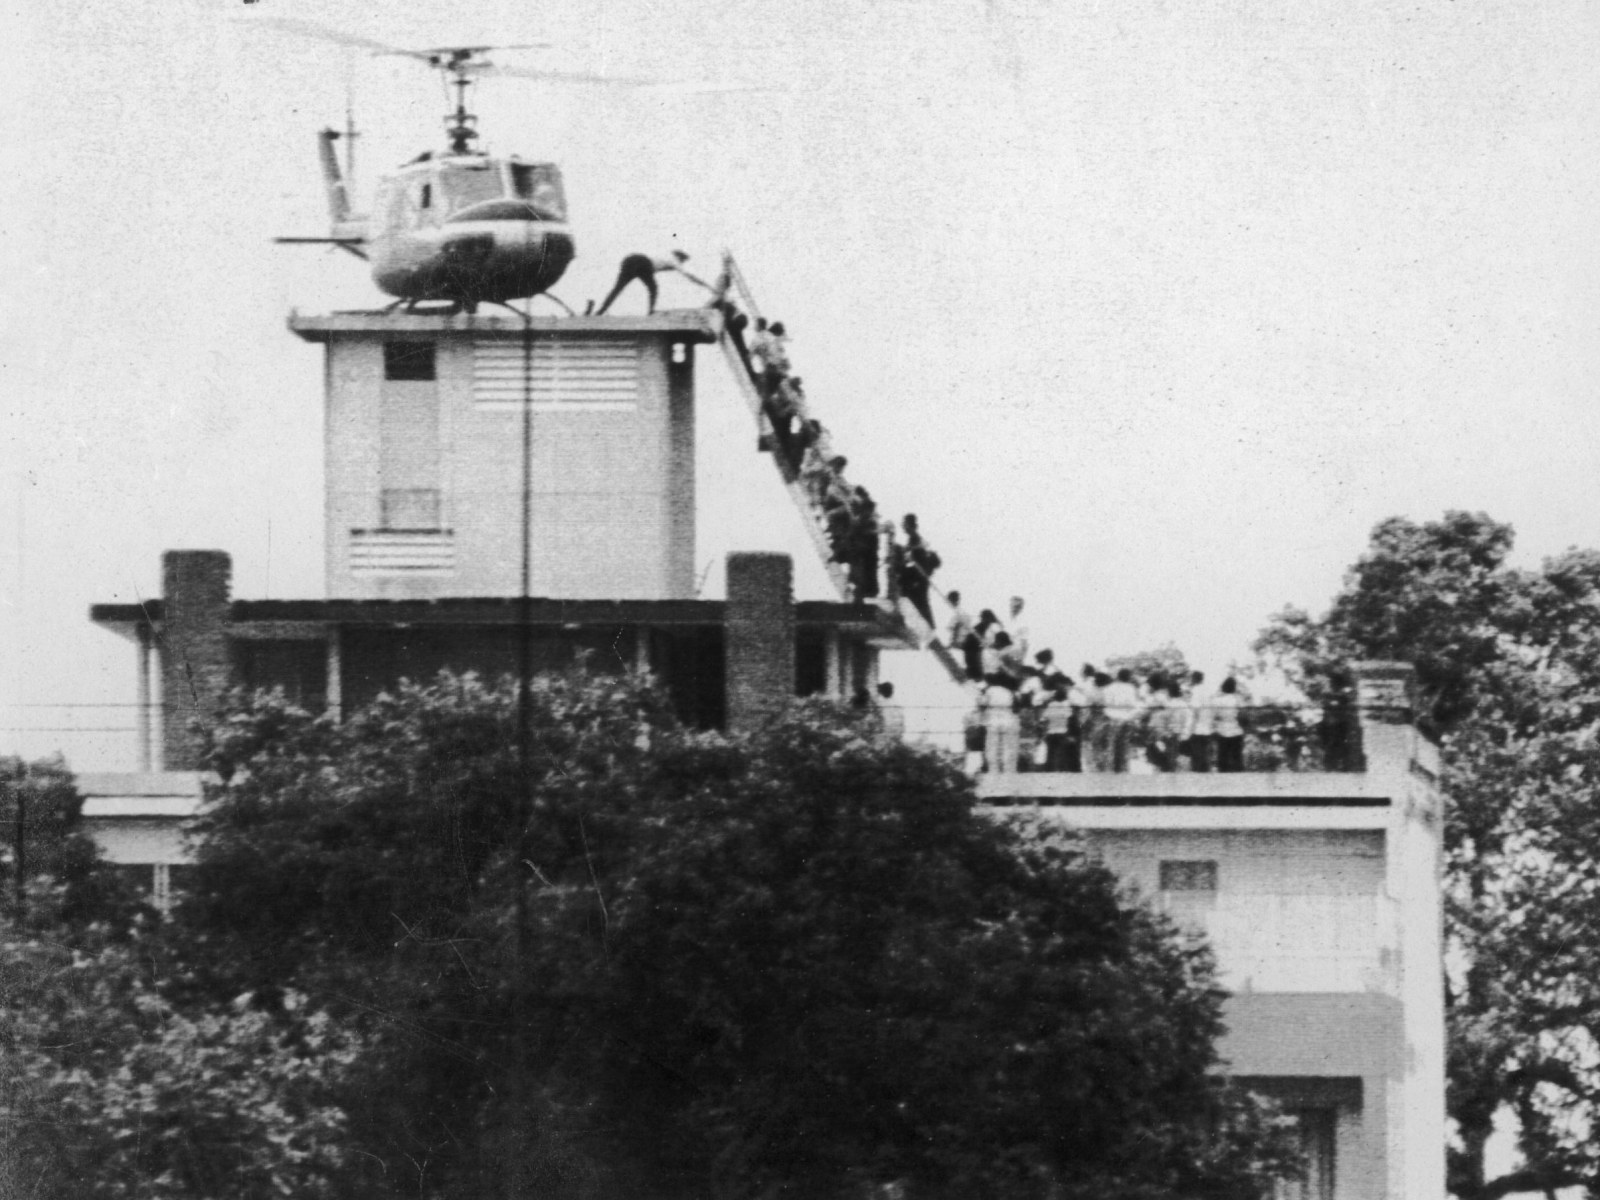 The last helicopter evacuating Saigon